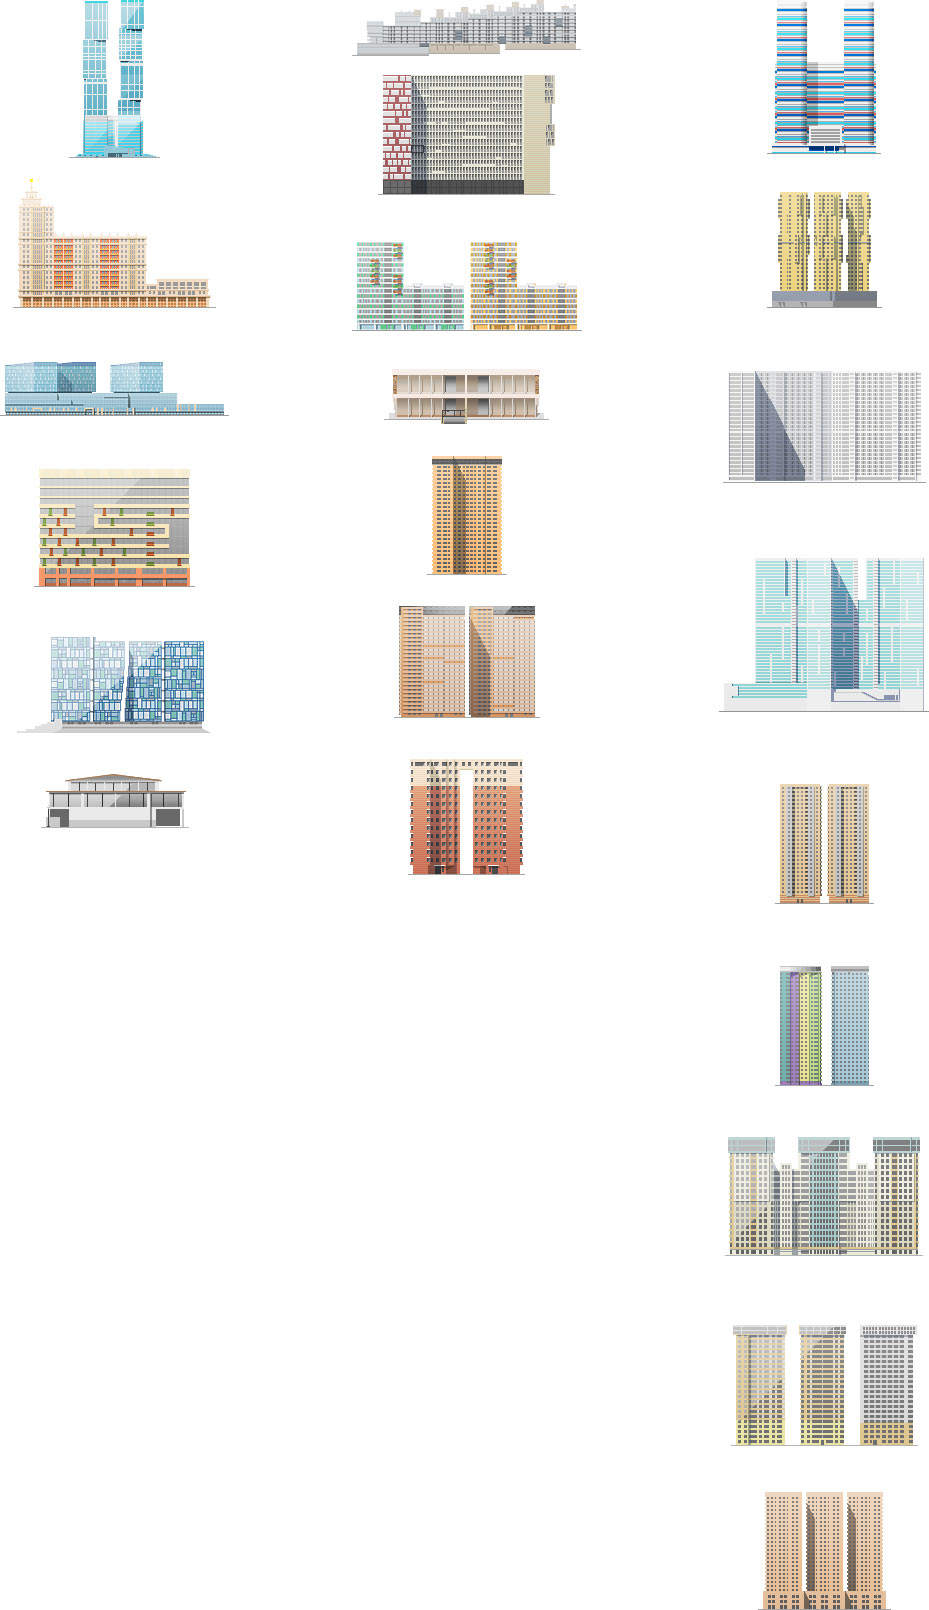 http://img.artlebedev.ru/everything/capitalgroup/site/process/capital-ideas-16.jpg